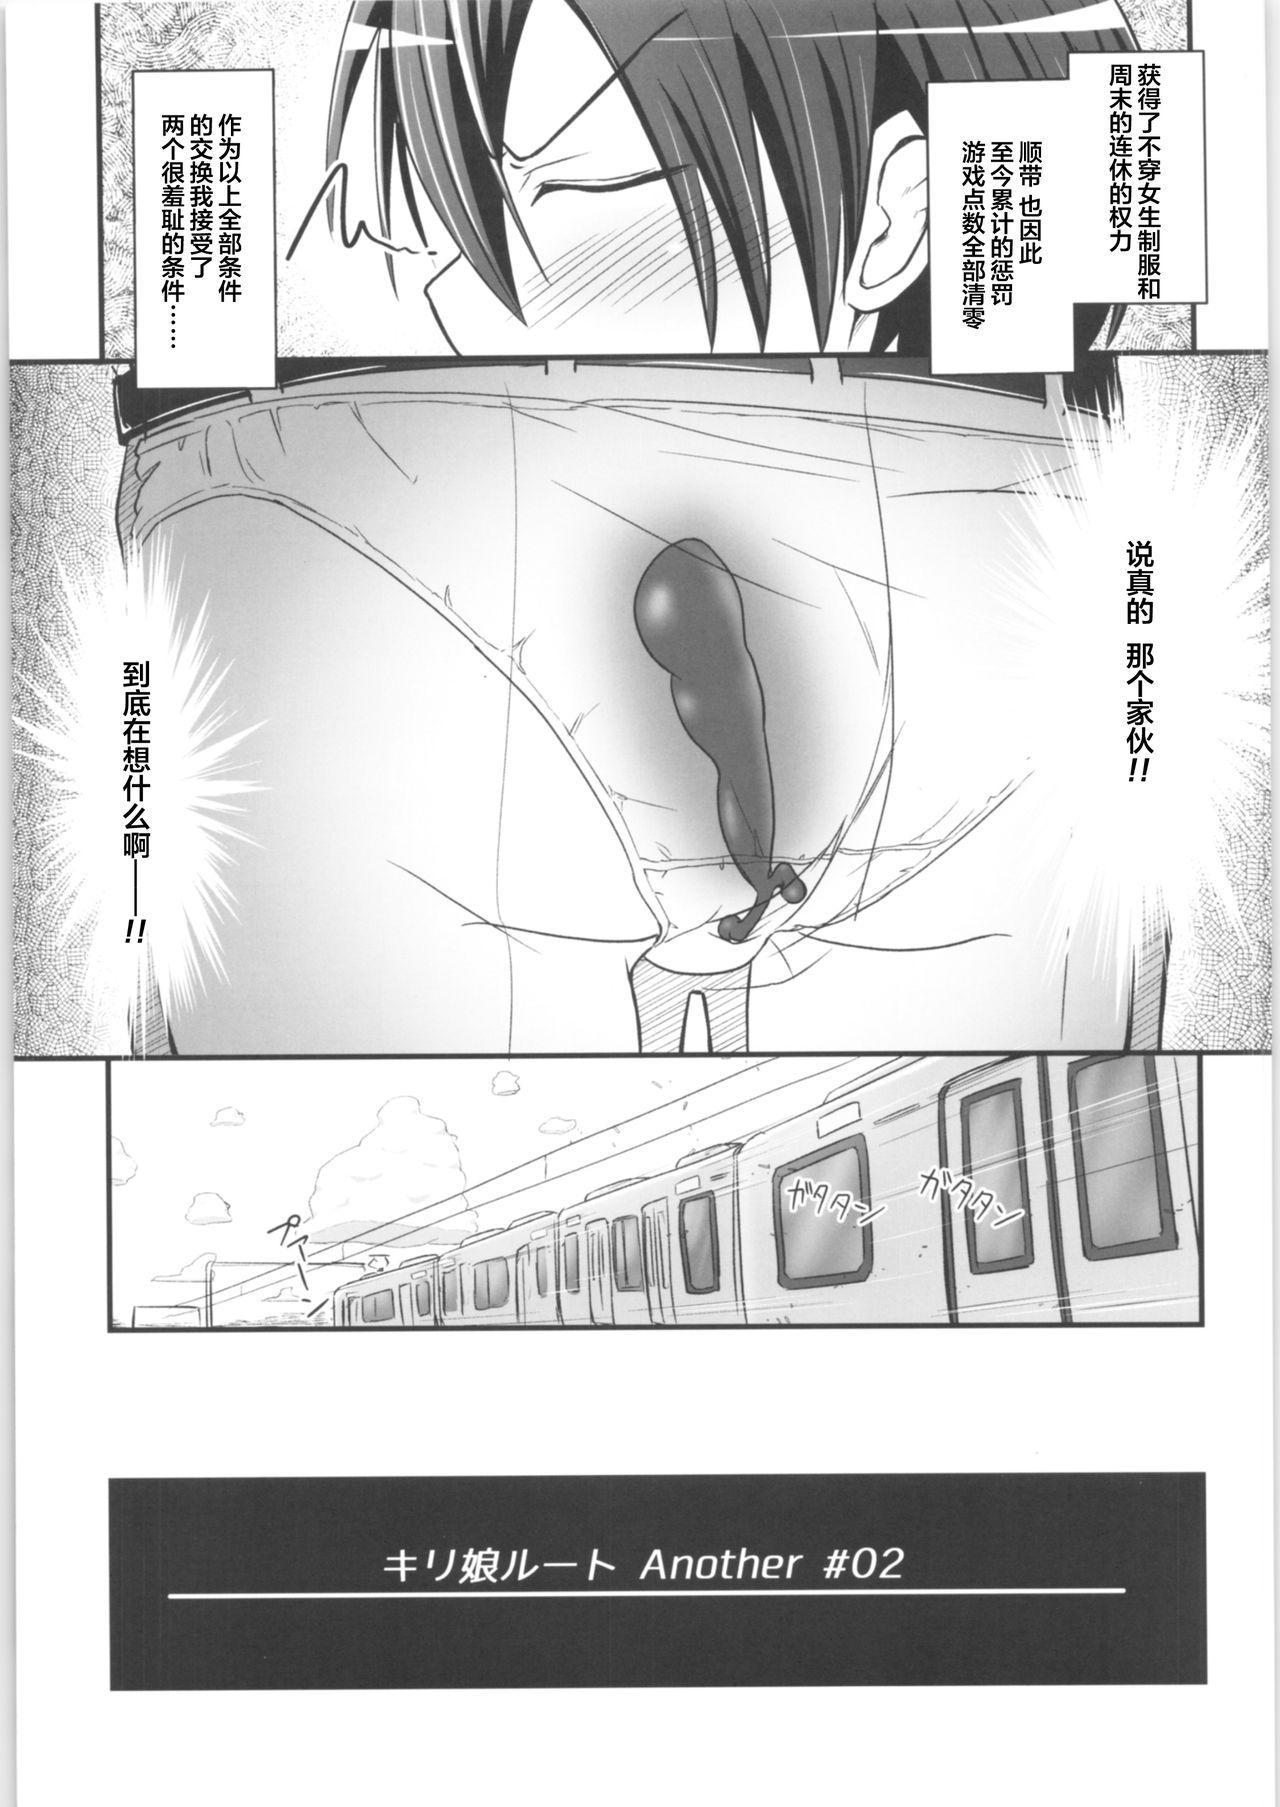 [Umari-ya (D-2)] Kiriko Route Another #02 ~Shitagi Josou Jii Kyouyou Hen~ (Sword Art Online)[Chinese]【不可视汉化】 4